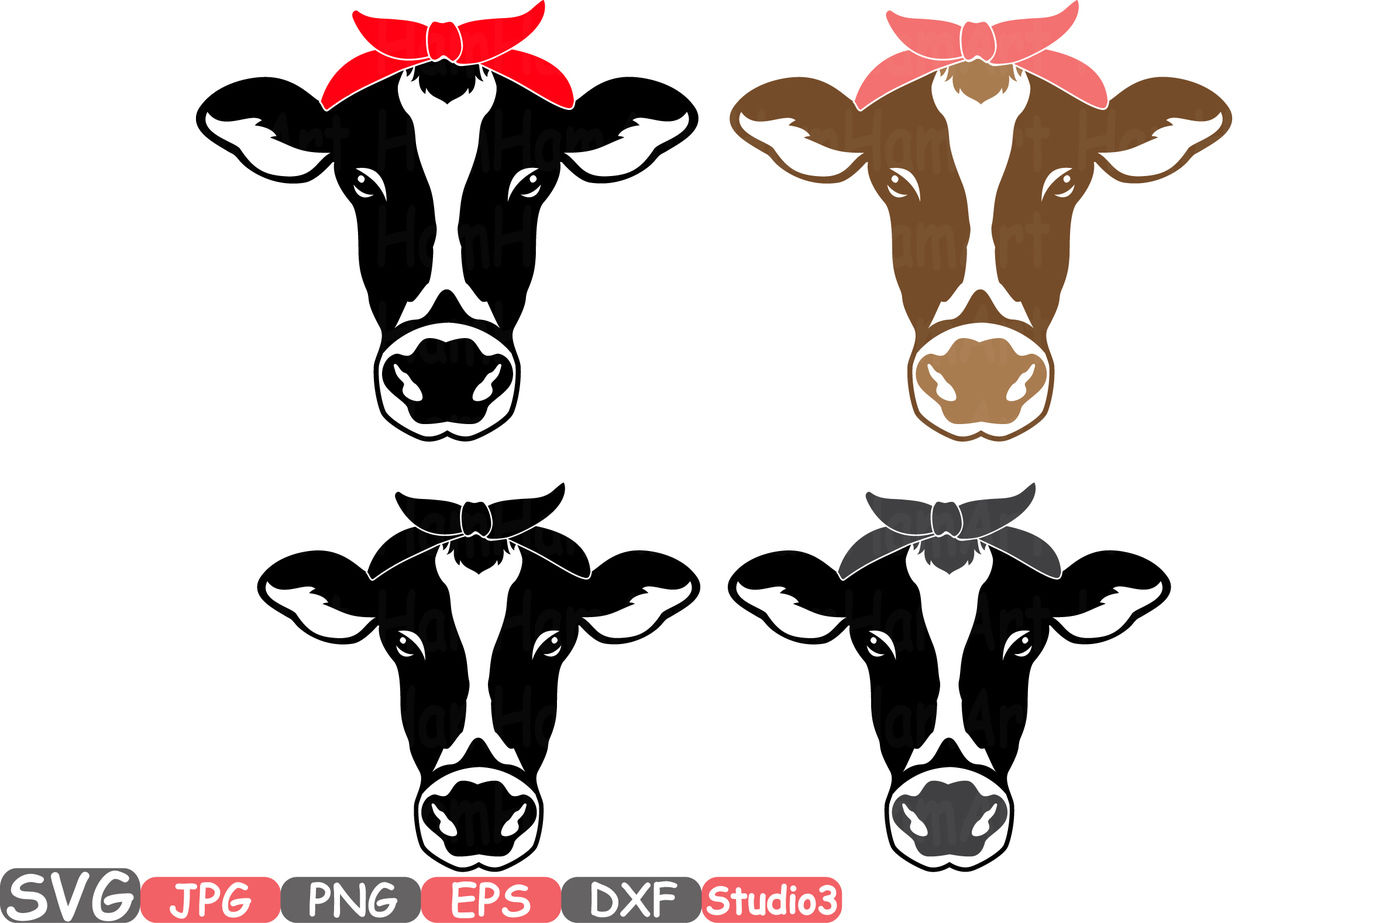 Cow Head Silhouette Svg Cowboy Western Farm Animal 768s By Hamhamart Thehungryjpeg Com